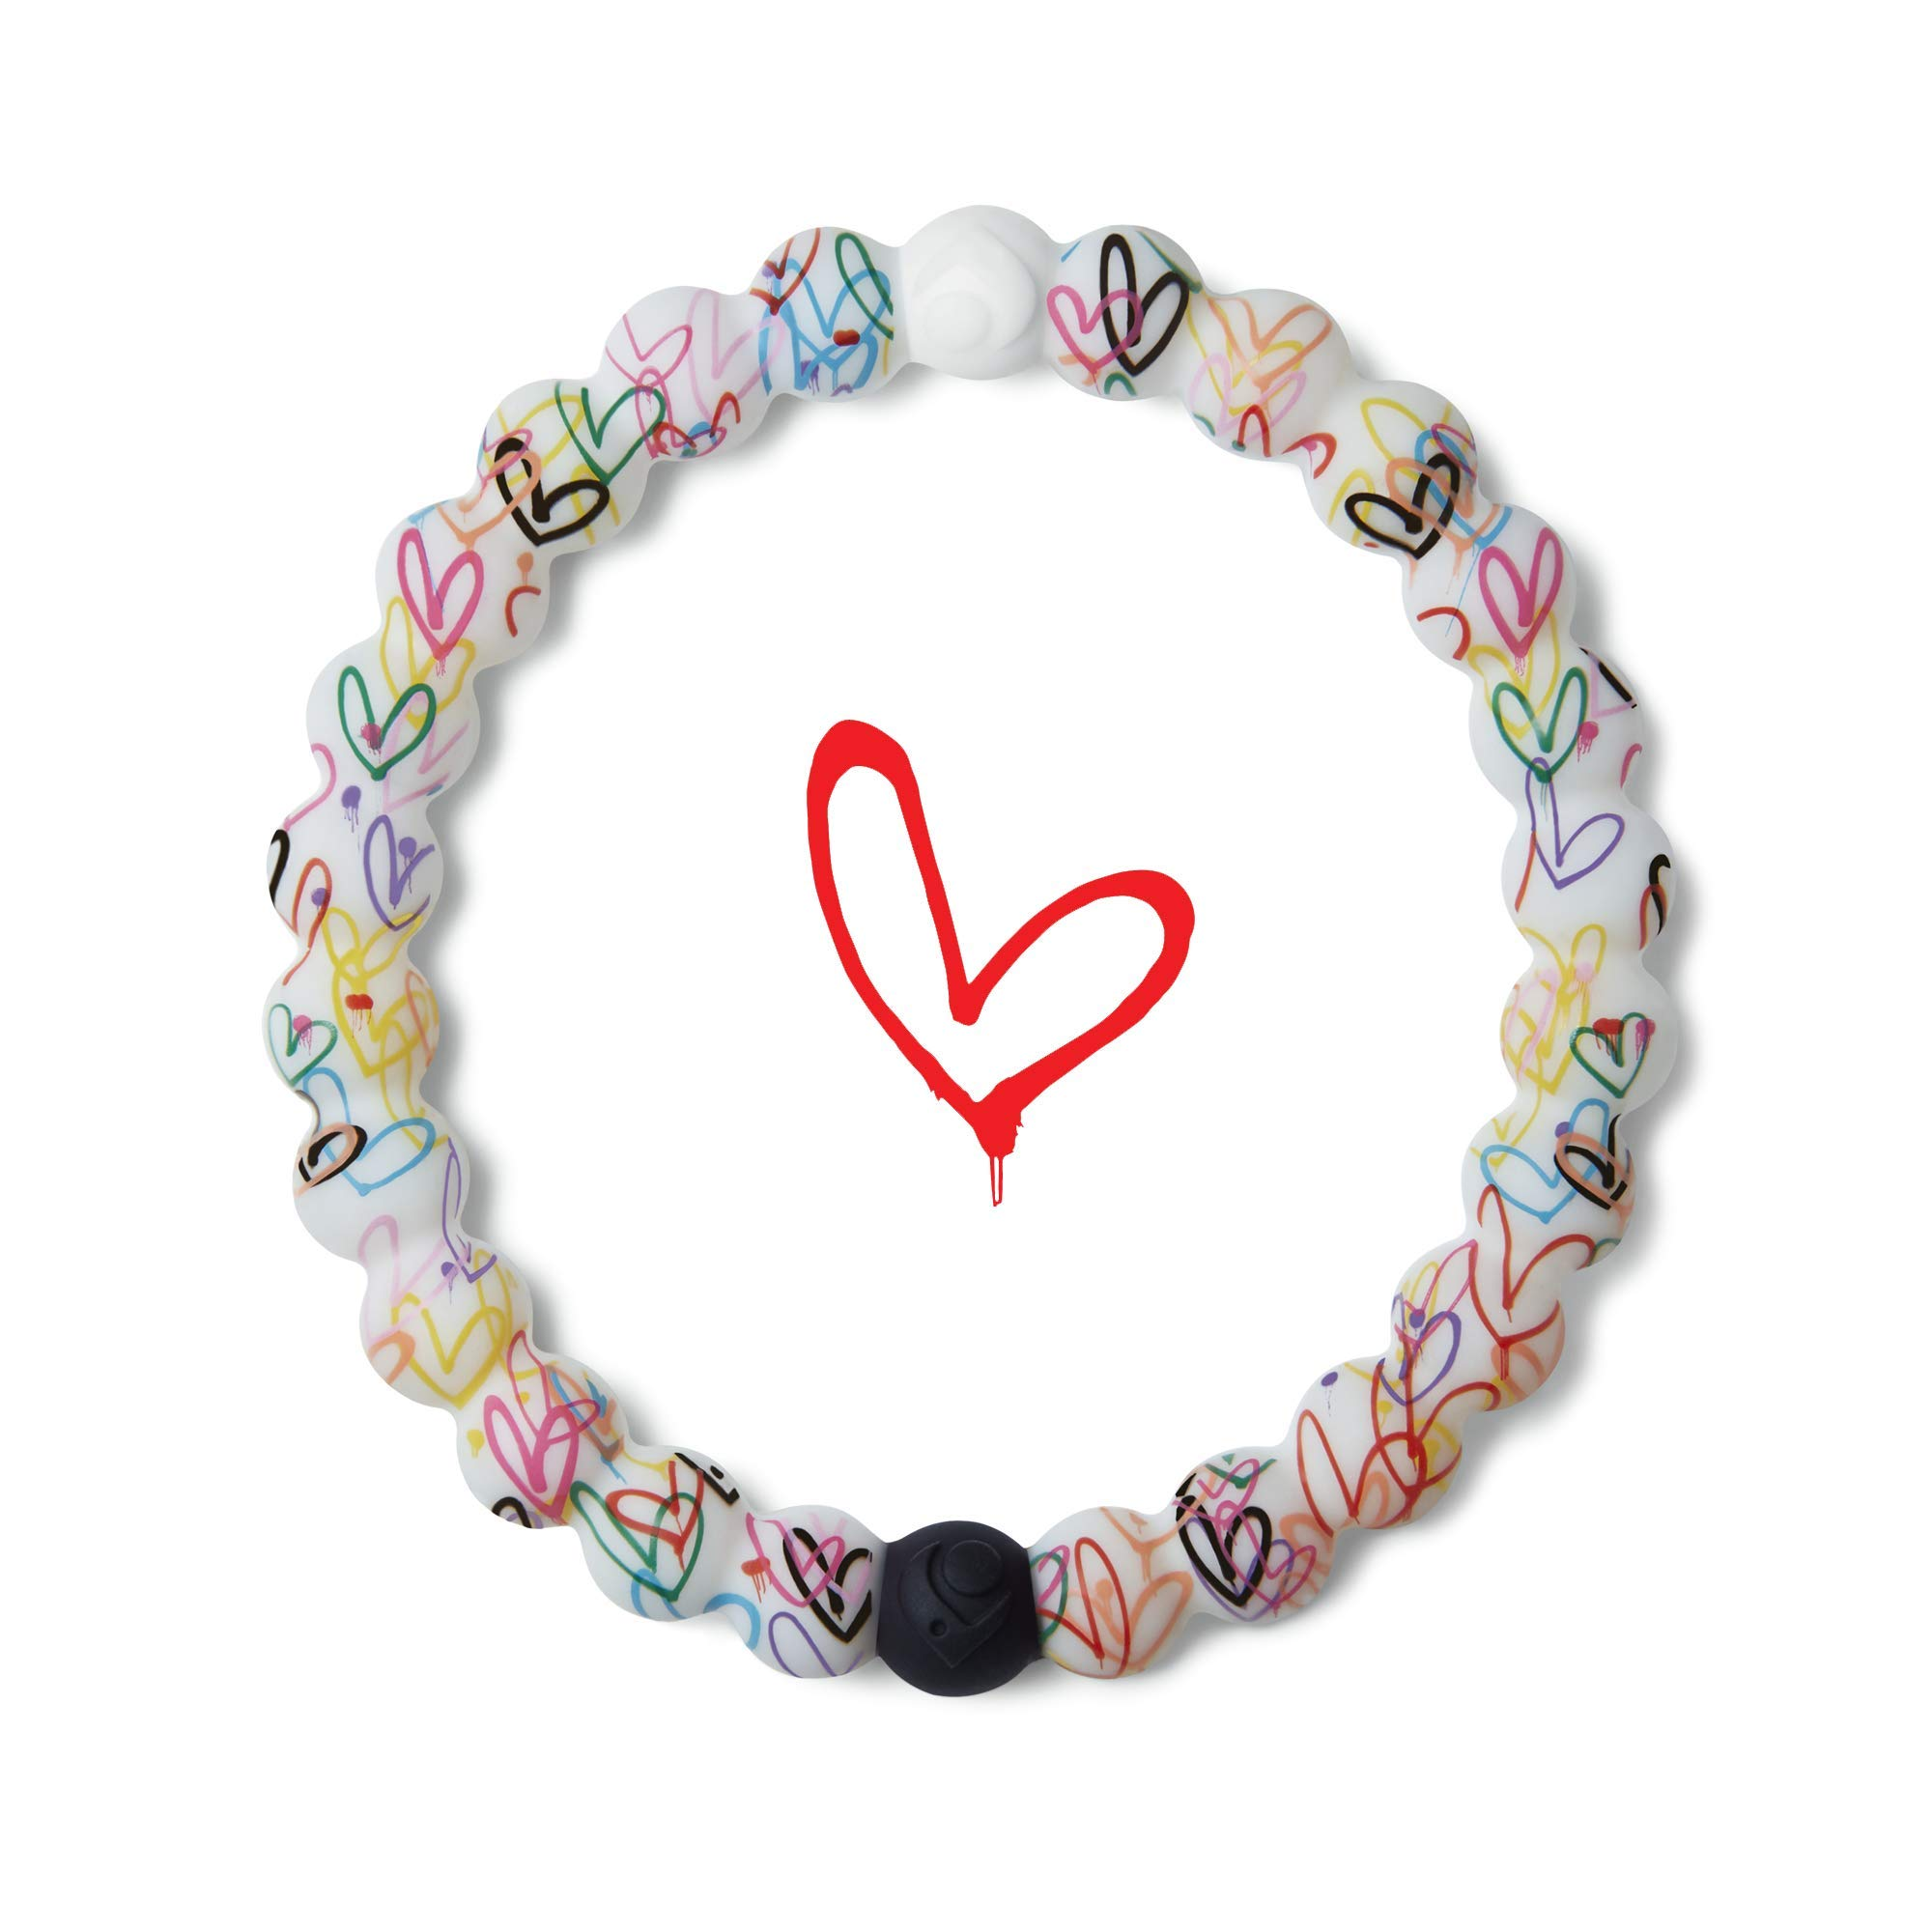 Lokai Hearts Cause Collection Bracelet, Medium by Lokai